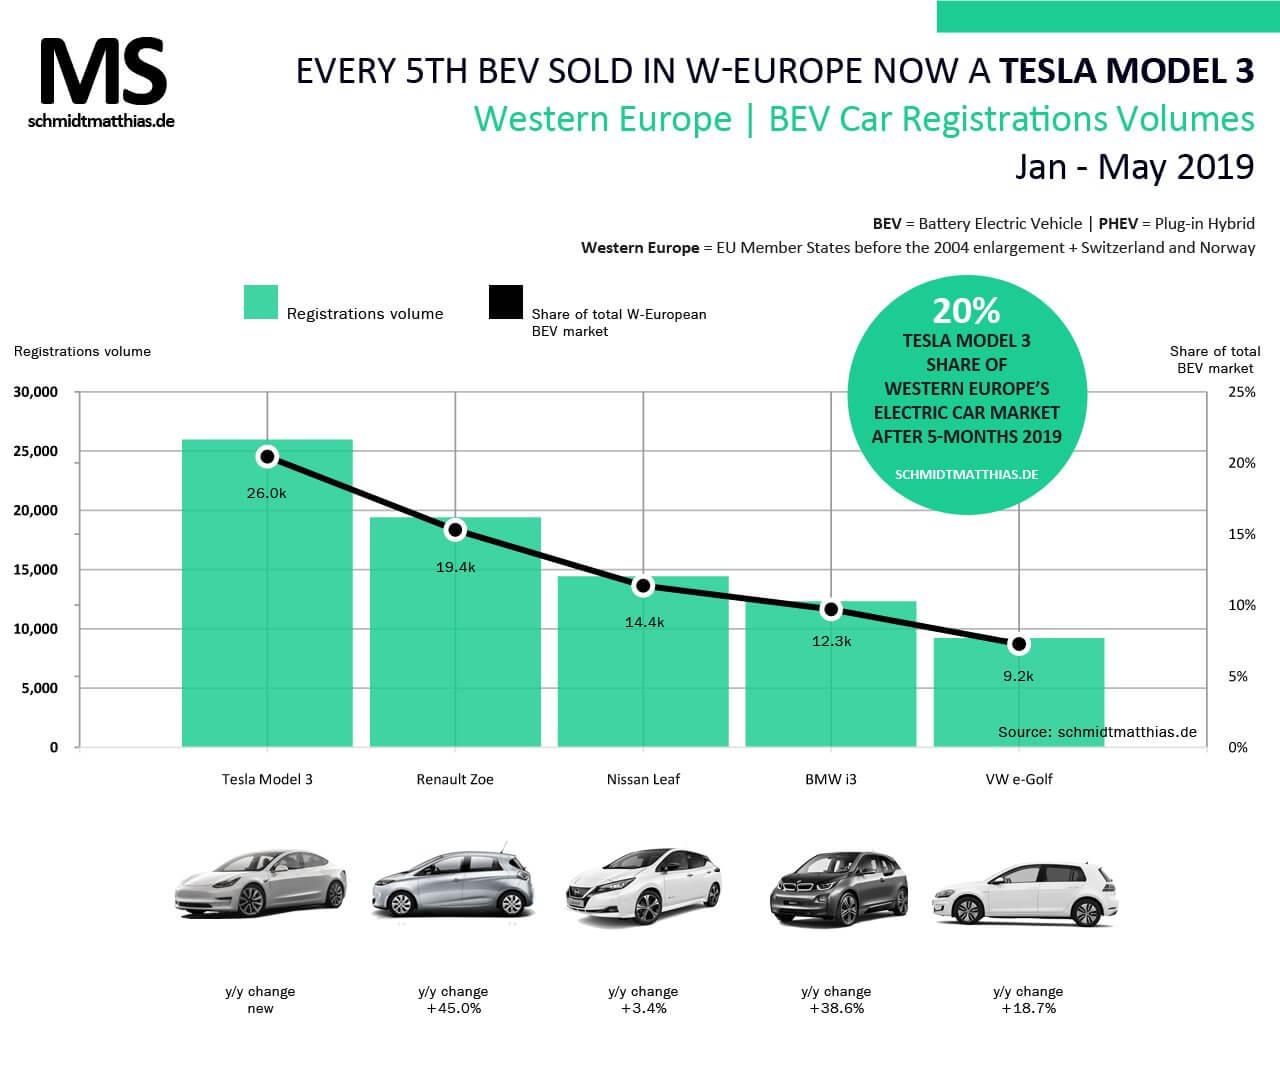 ТОП-5 самых продаваемых электромобилей Европы за 5 месяцев 2019 года